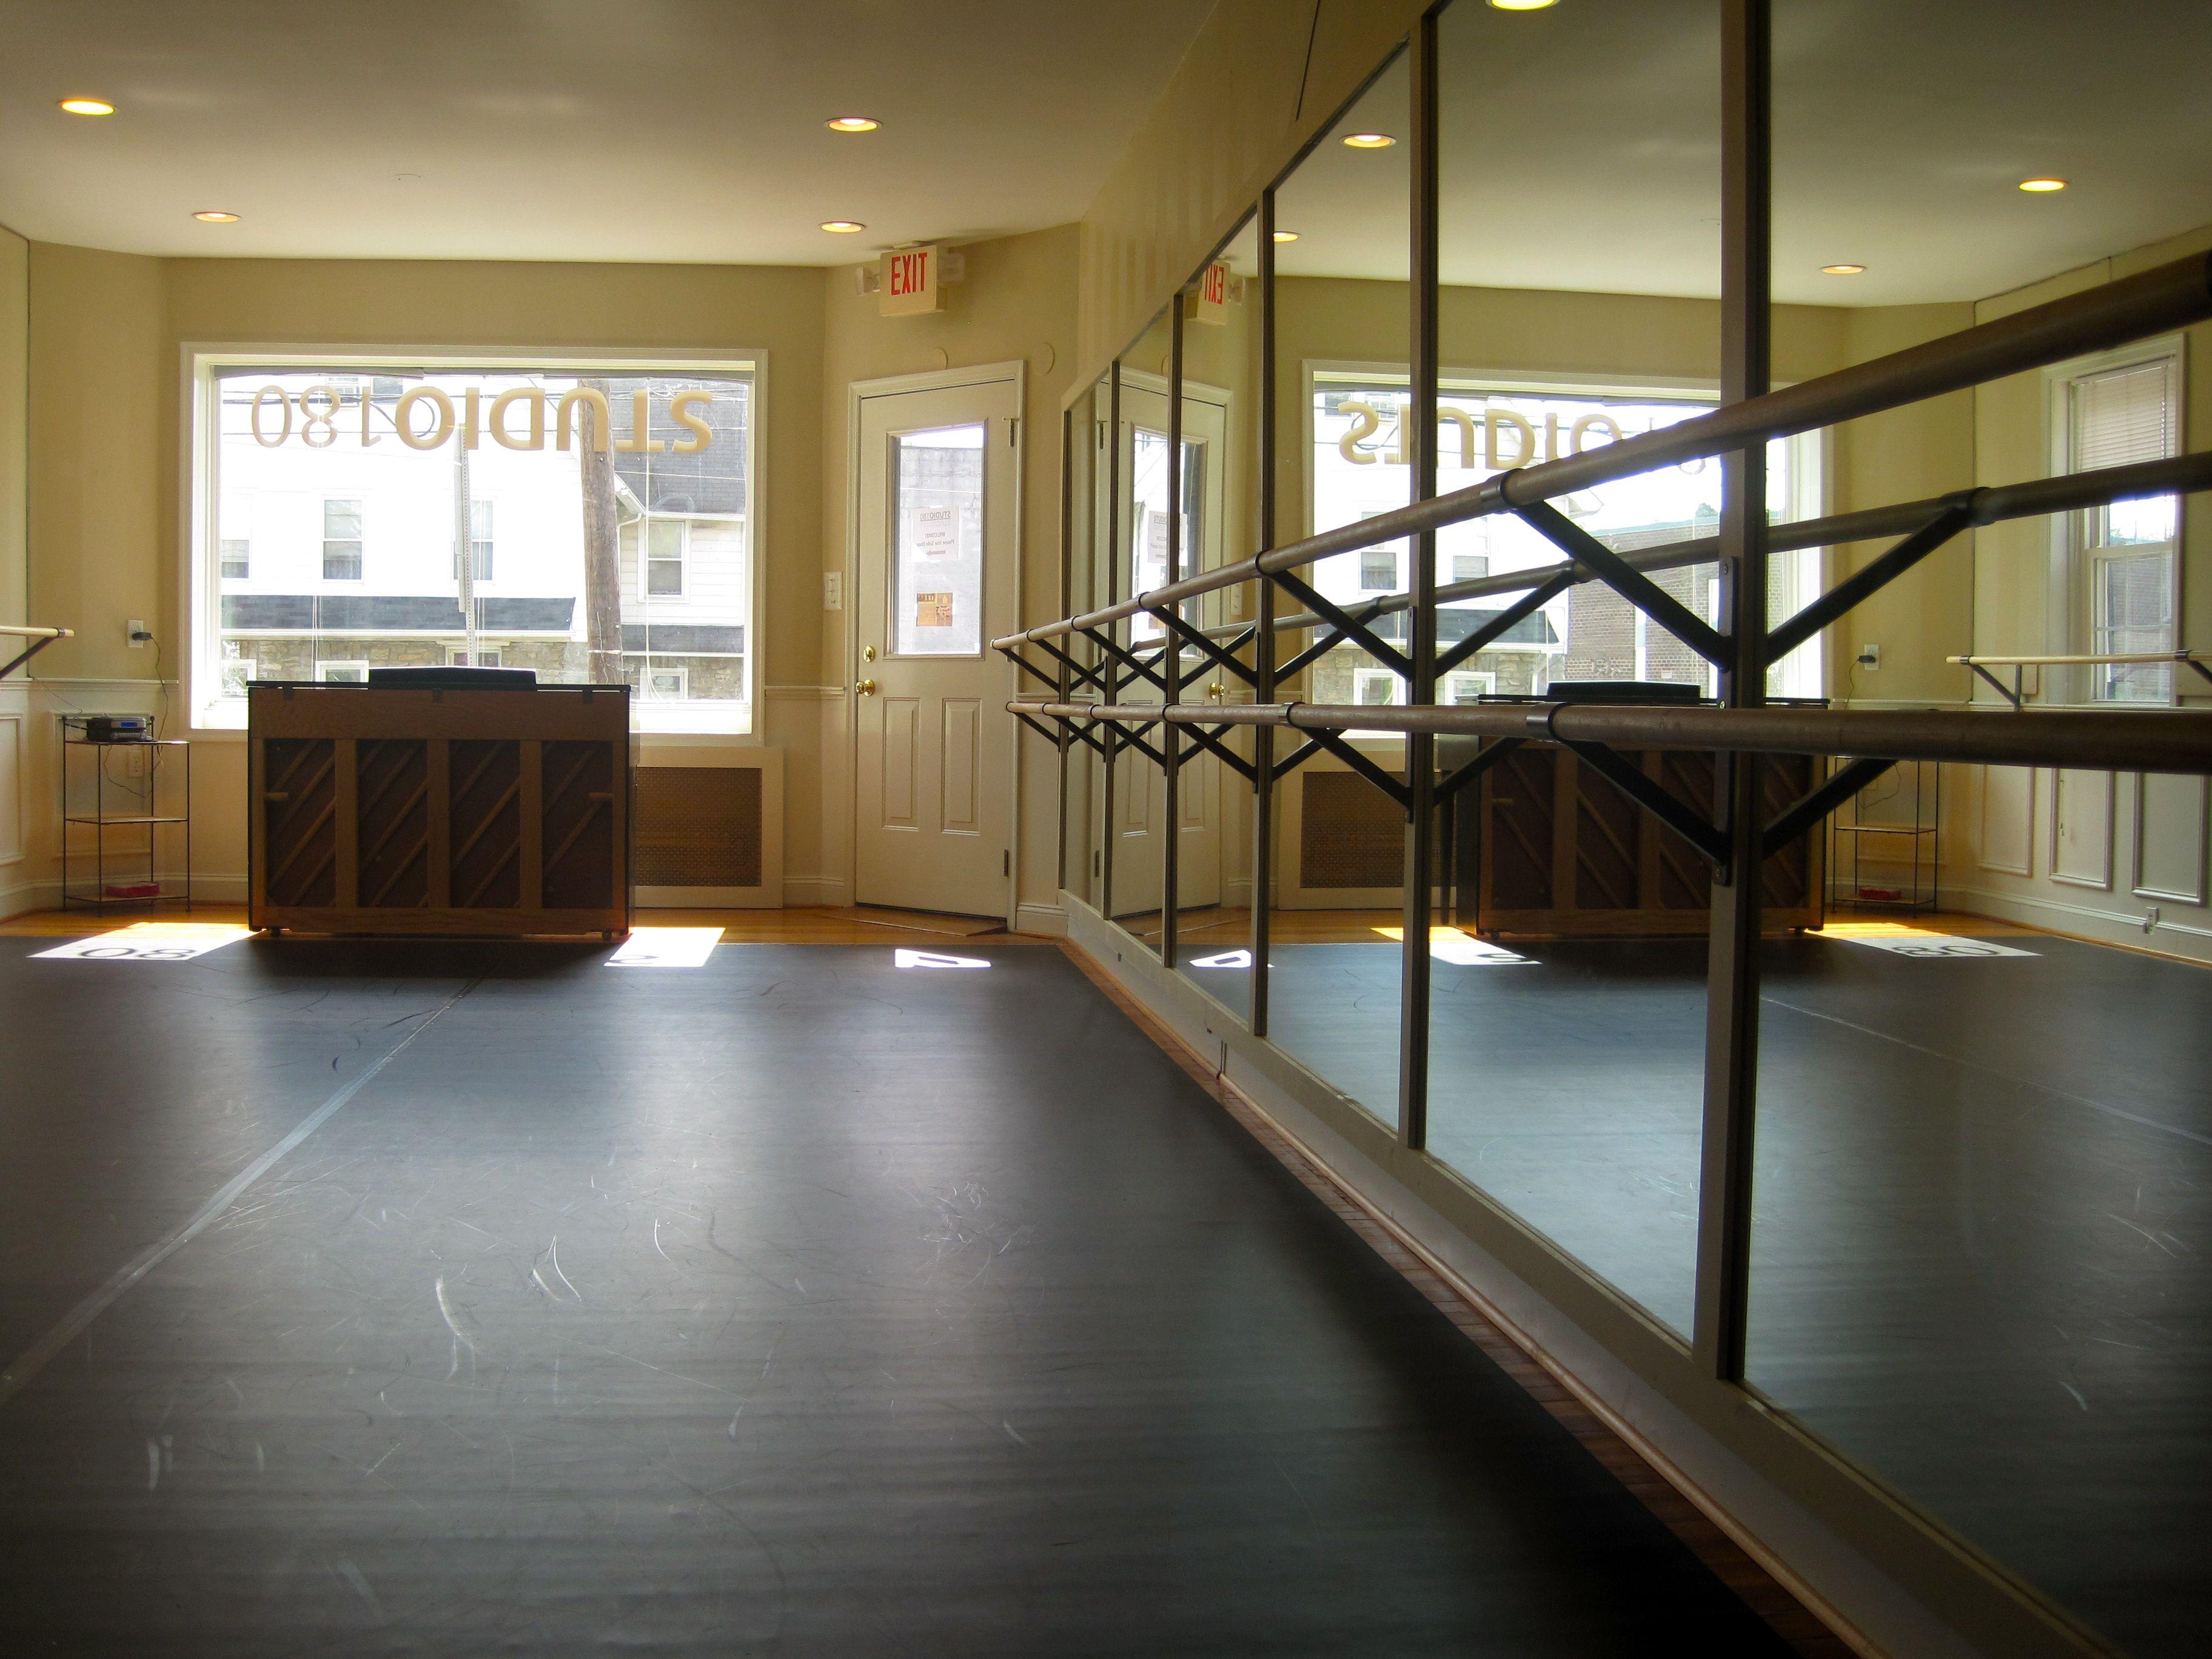 Marley Dance Floor For Home Studio Taraba Home Review